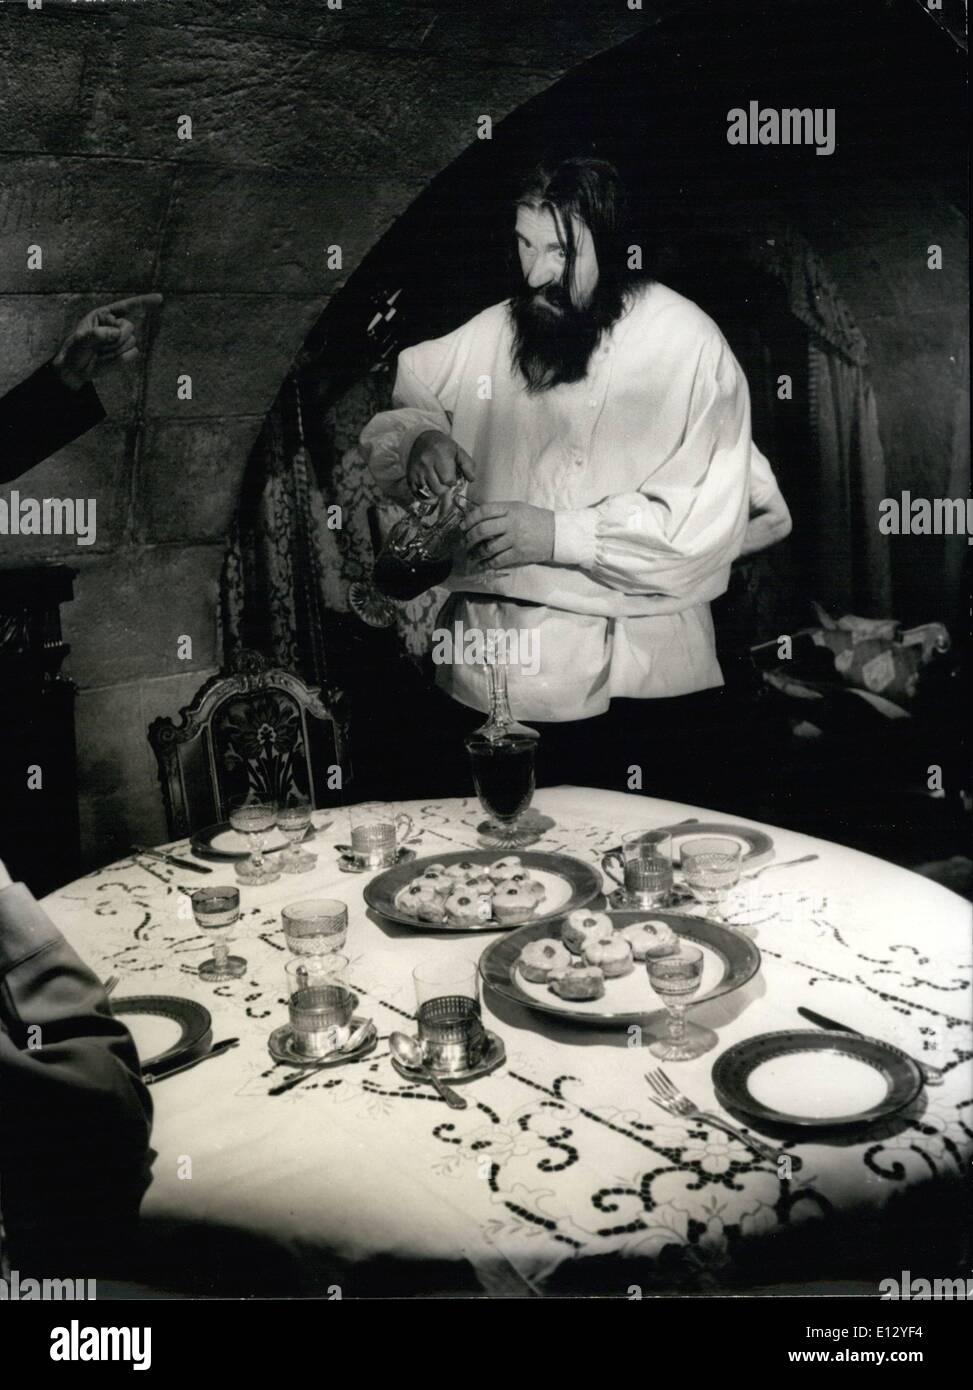 Feb. 26, 2012 - Rasputin Played by Gert Froebe. - Stock Image